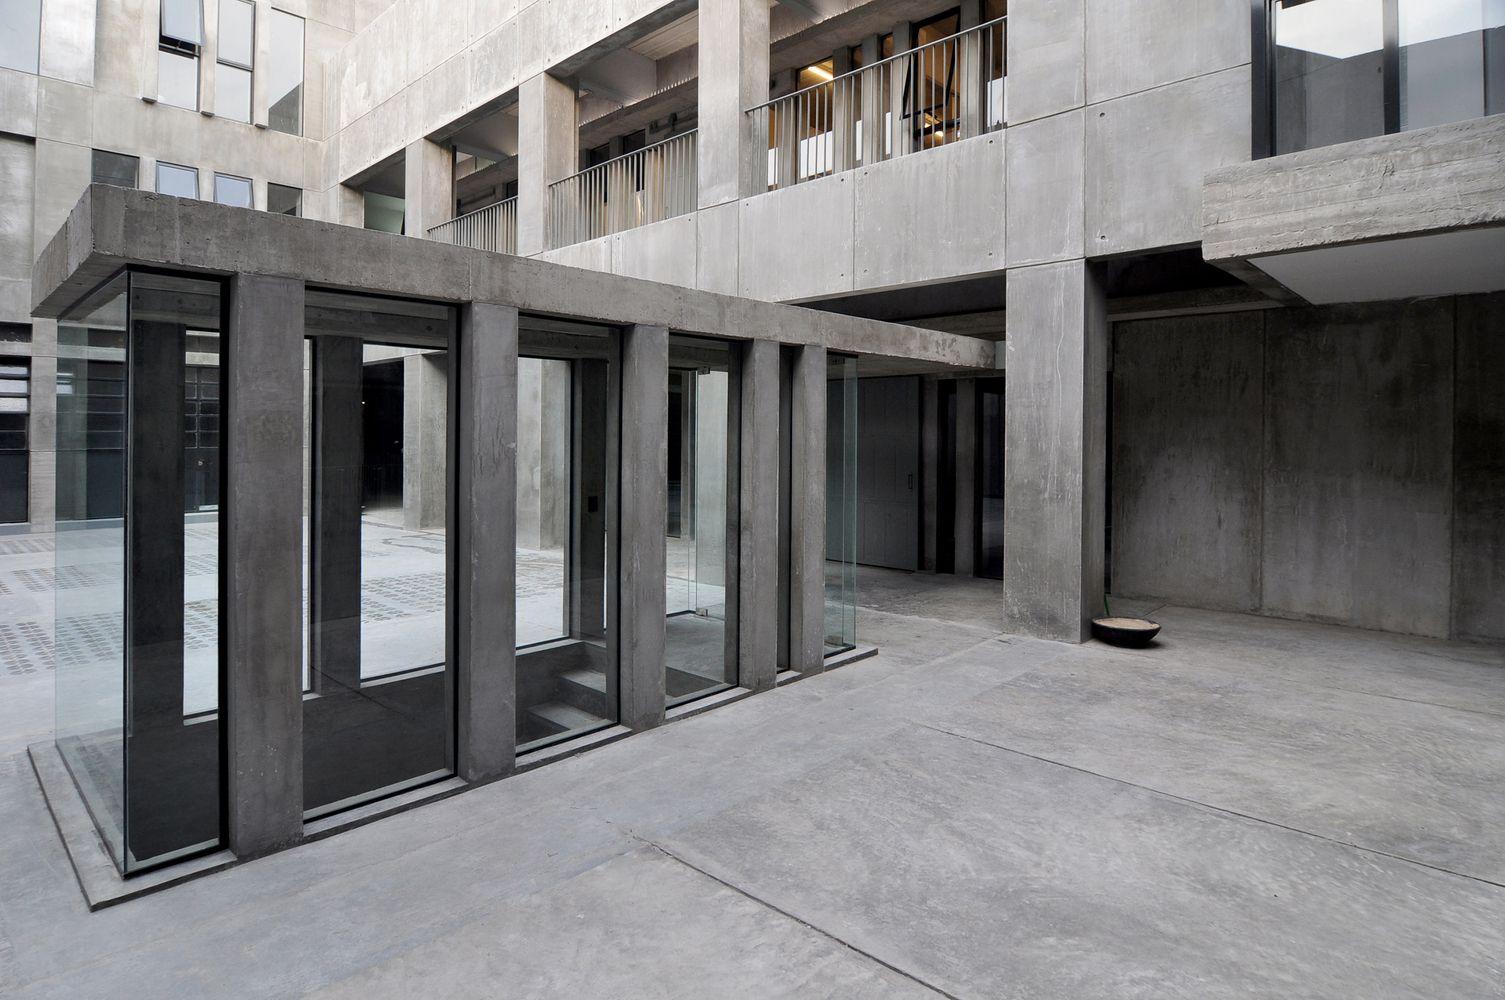 Gallery of Bubble Studios / Ramiro Zubeldia - 1